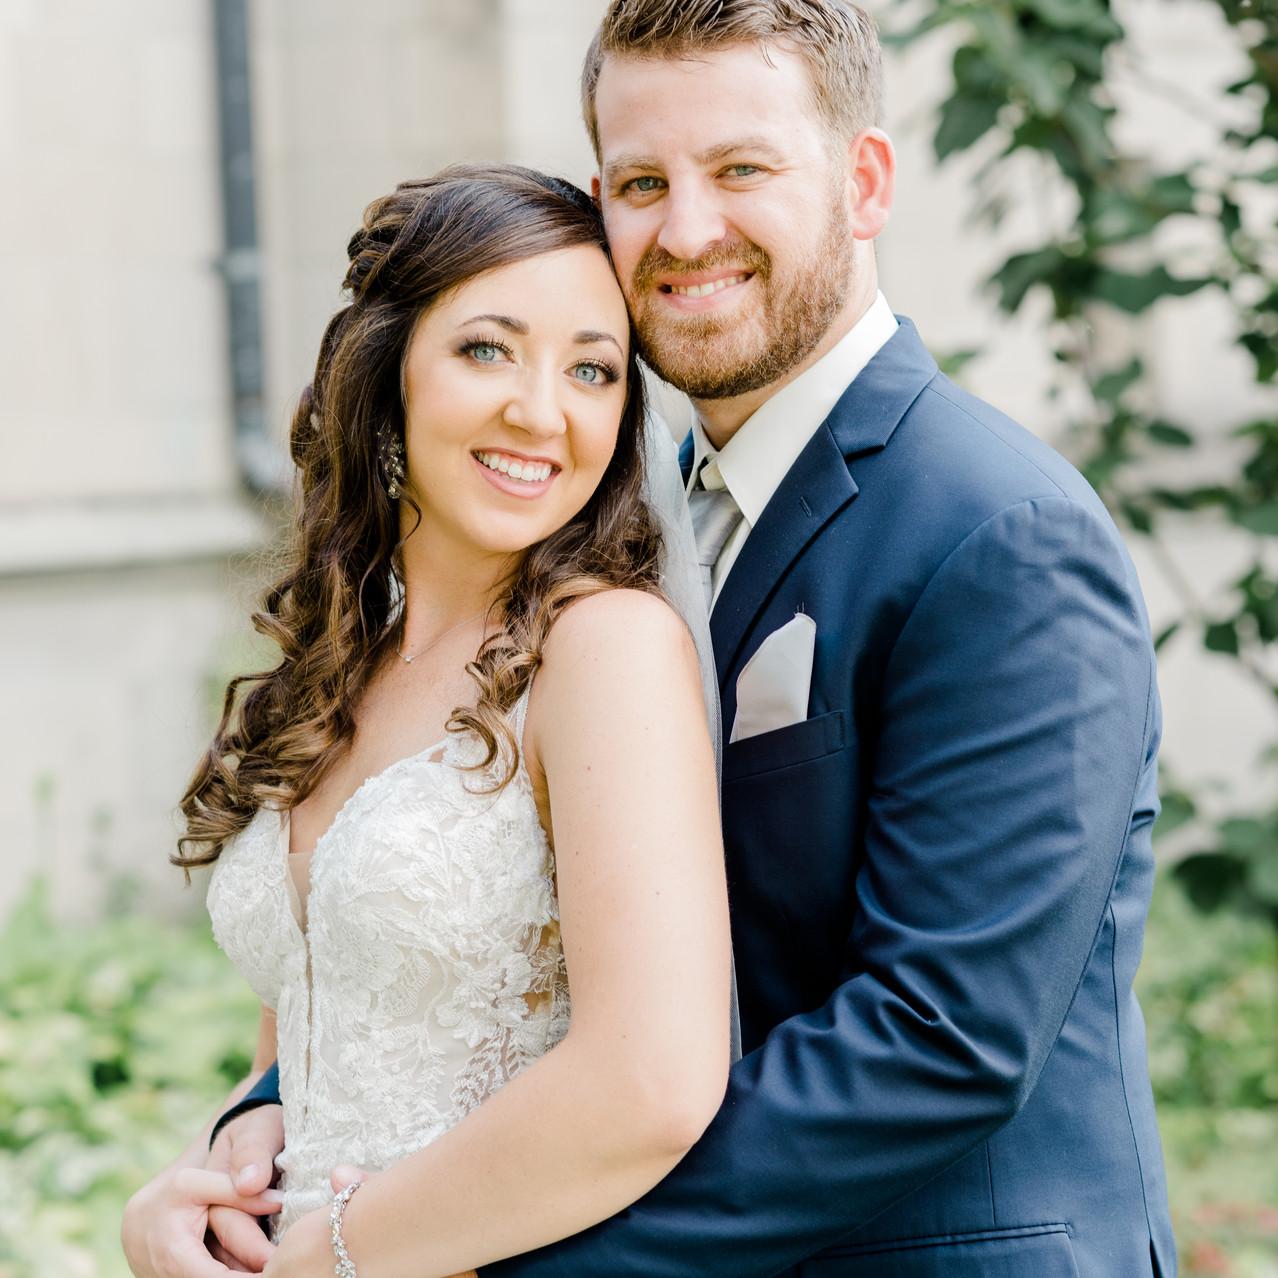 St. Louis Wedding Photographer & Videographer